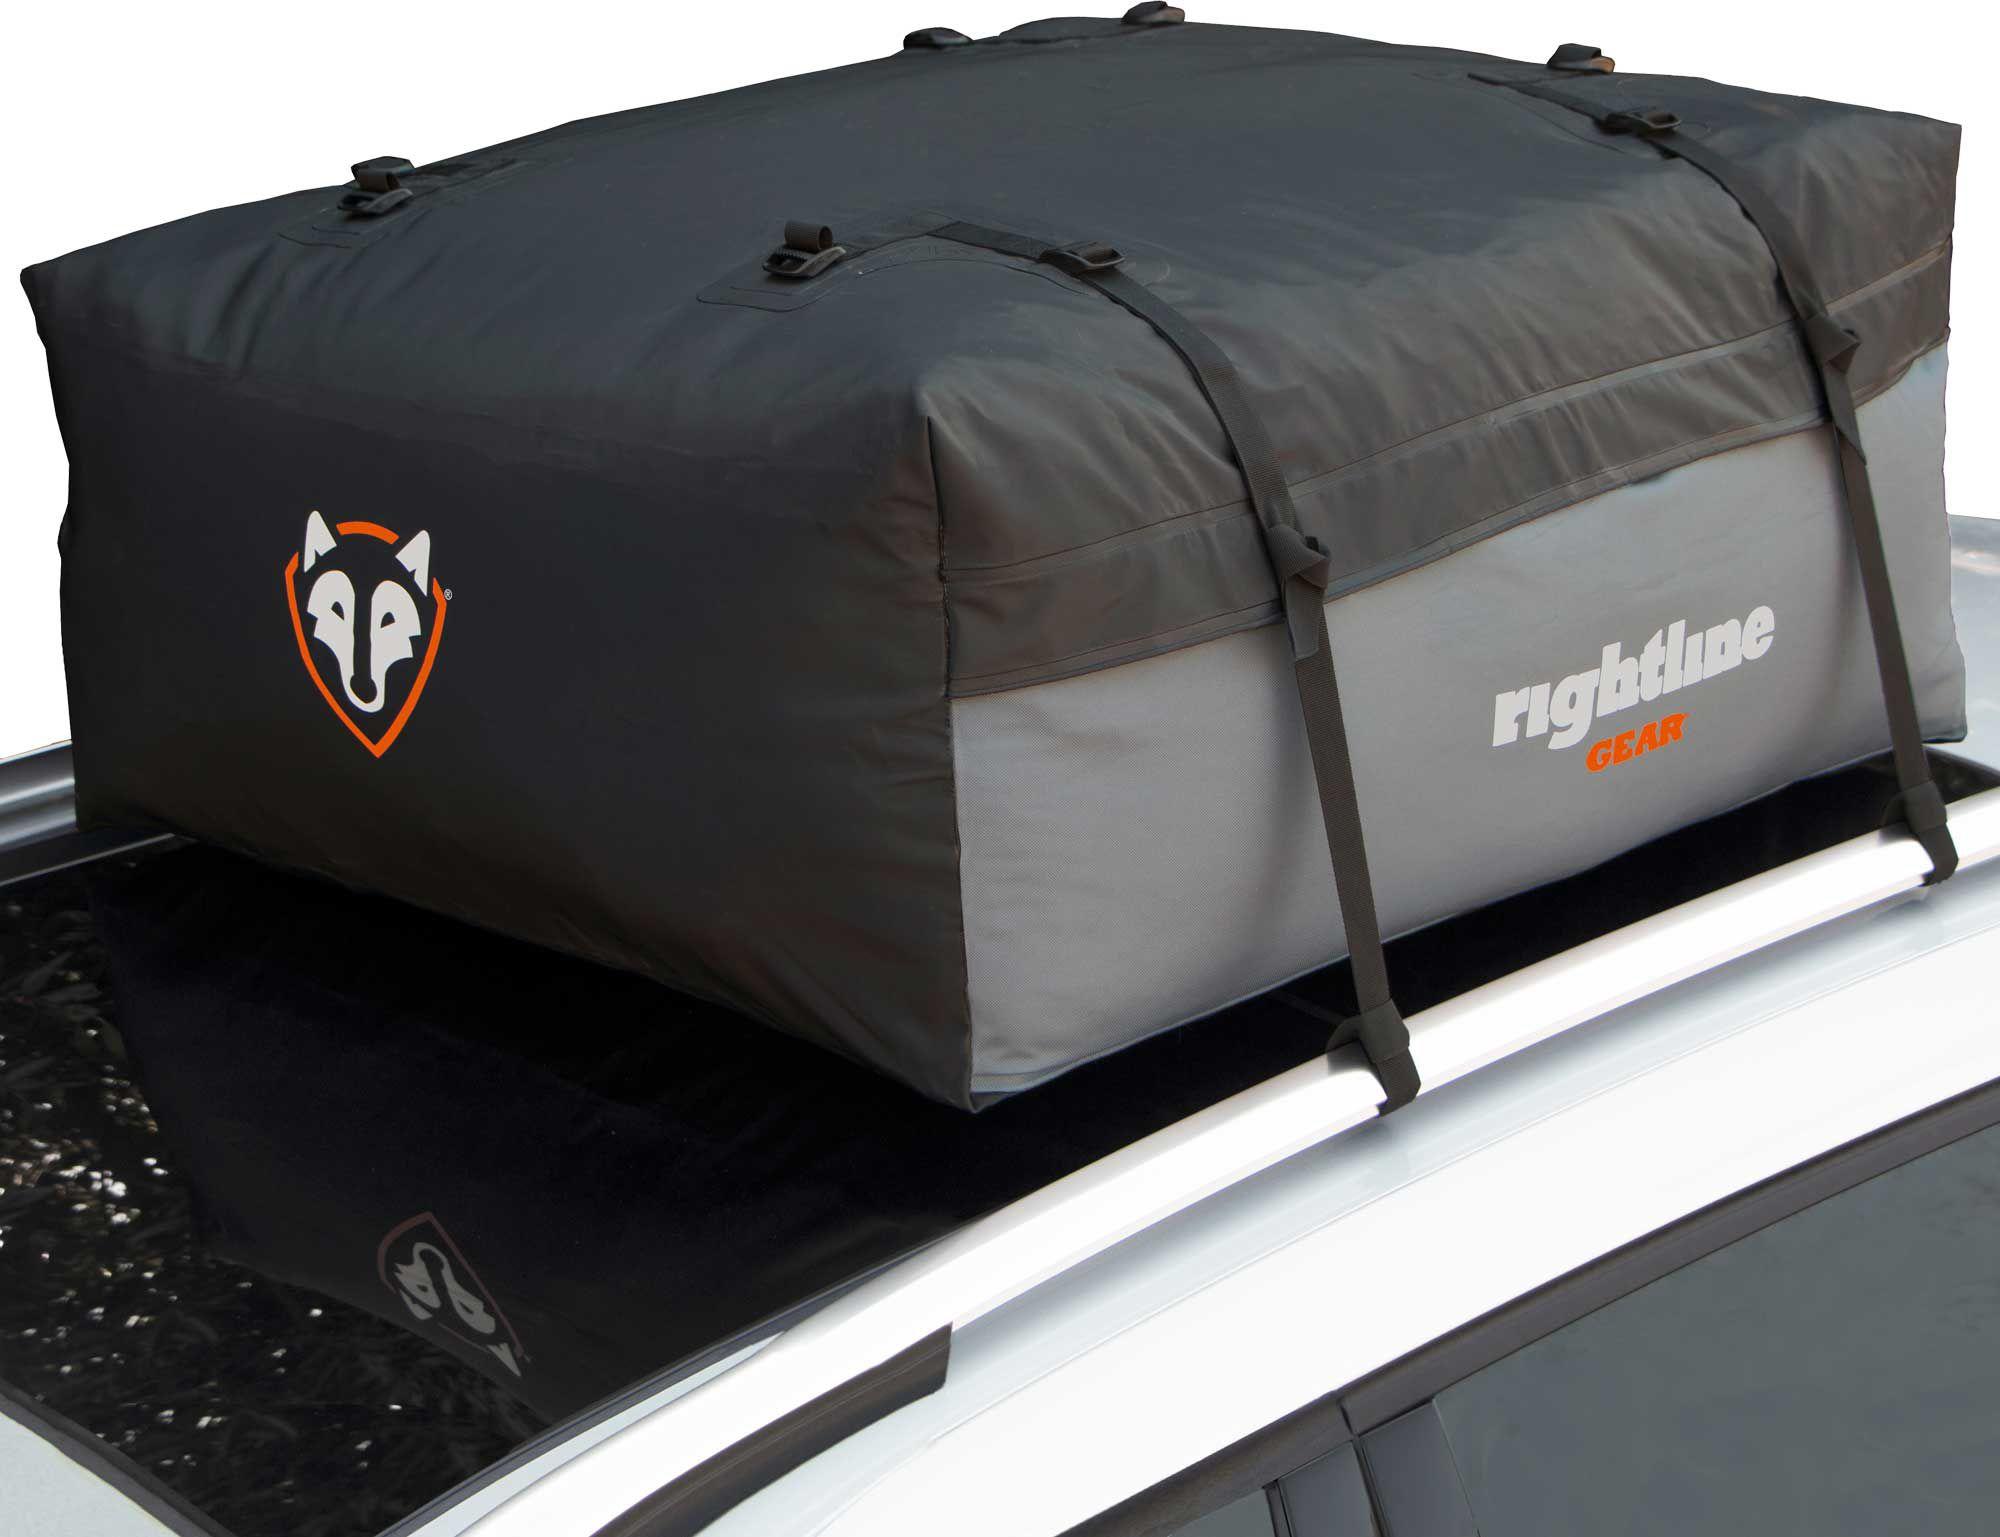 Product Image Rightline Gear Sport Jr Car Top Carrier